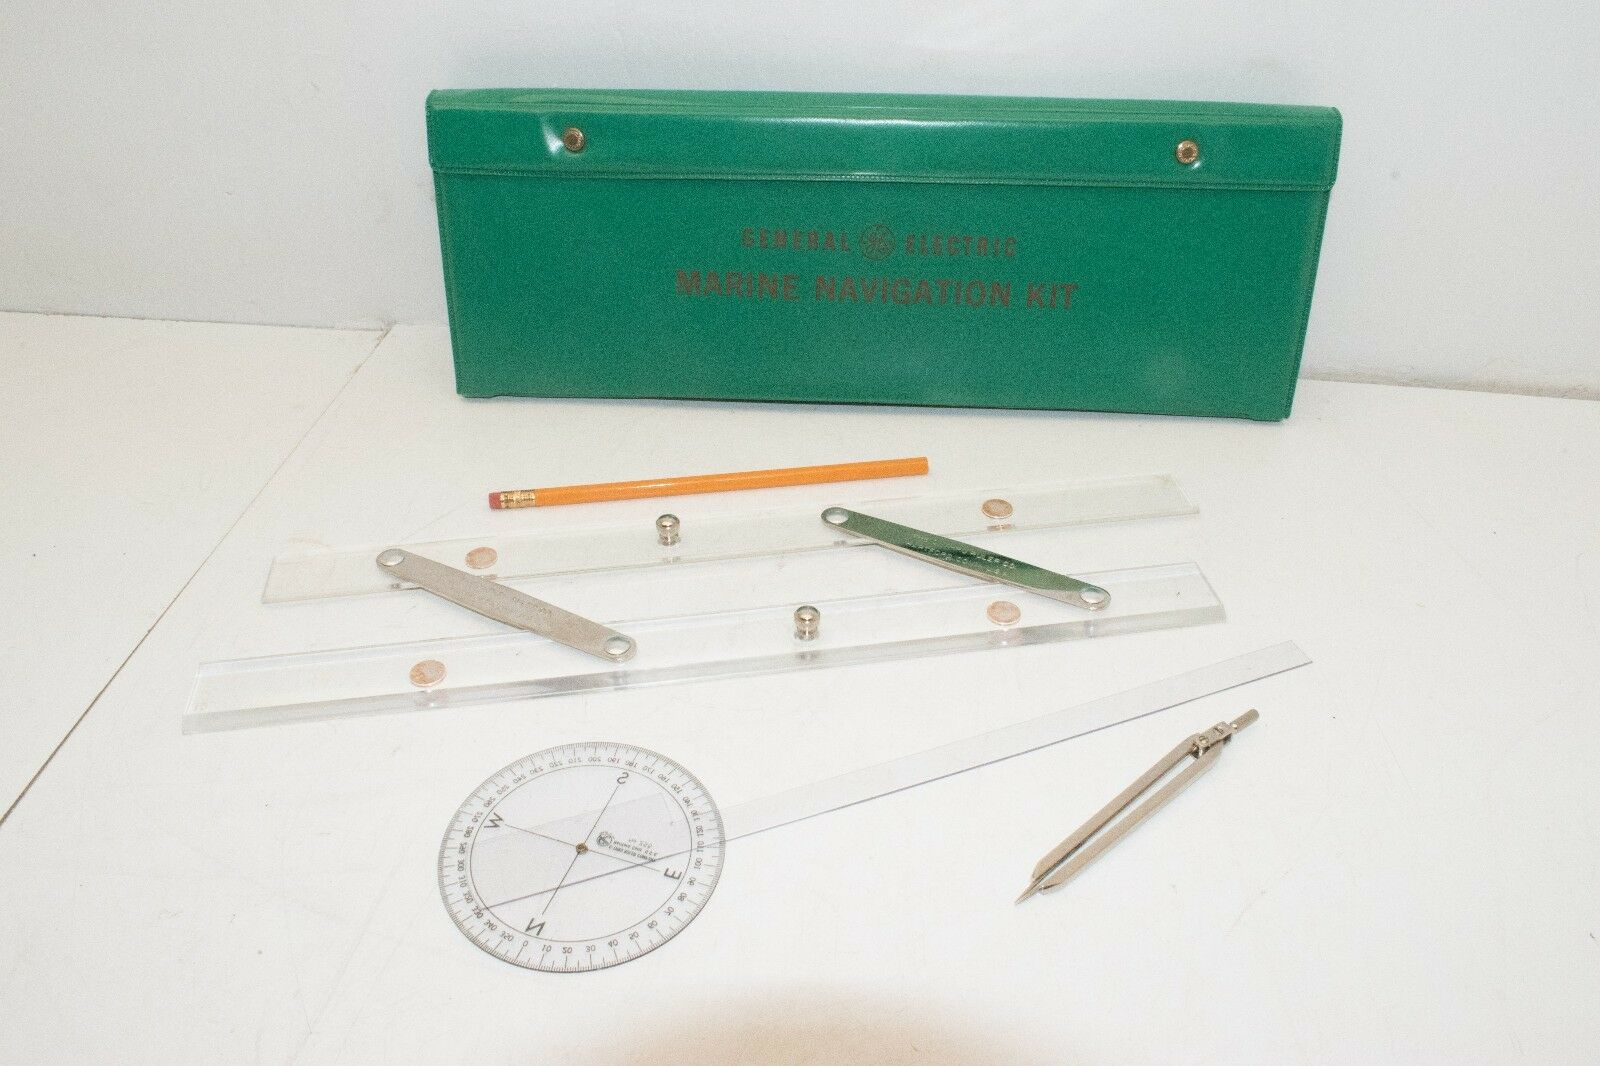 Vtg General Electric GE Marine Navigation Kit C-Thru Ruler w  Original Box